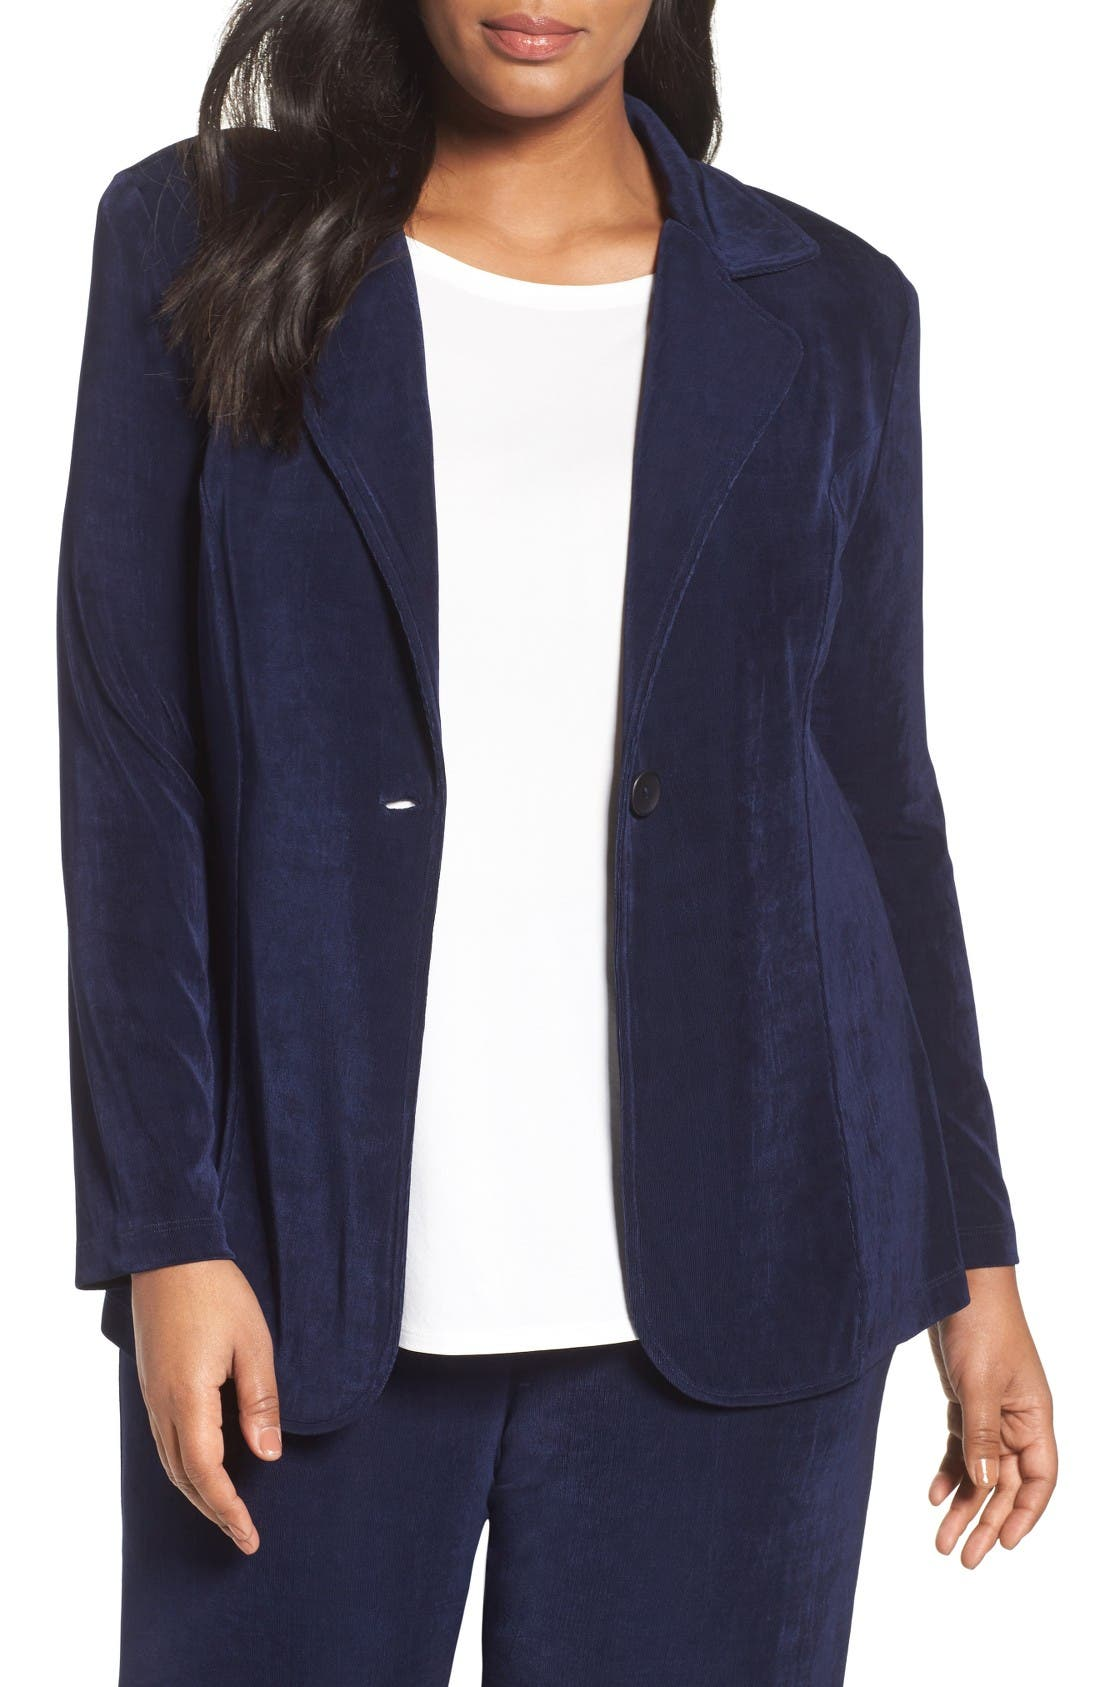 One-Button Stretch Knit Blazer,                         Main,                         color, Navy